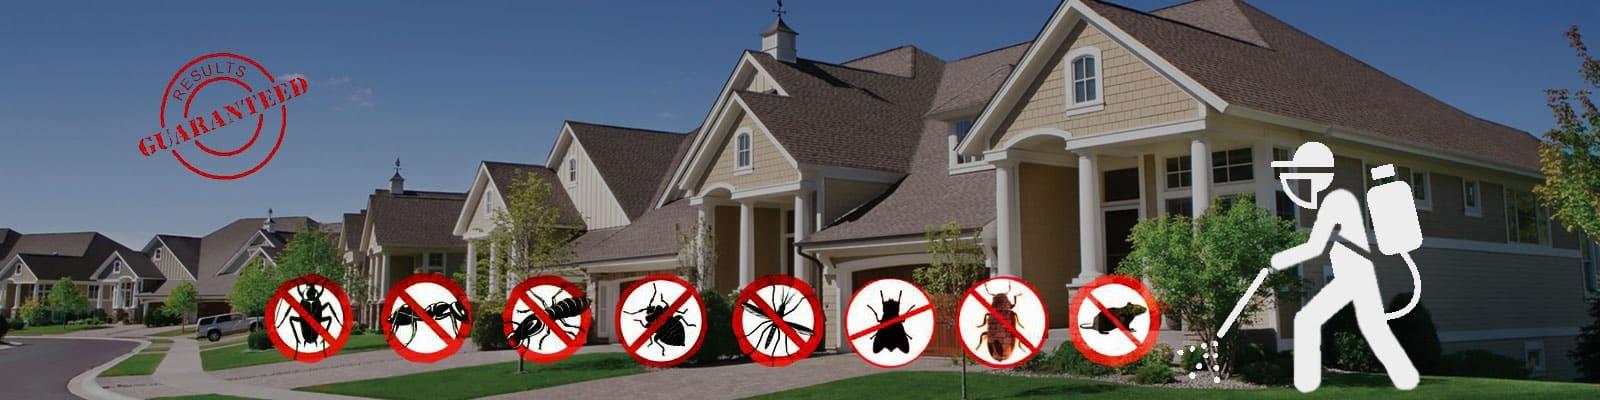 Black Horse Pest Control Company (@blackhorsepestcontrol) Cover Image